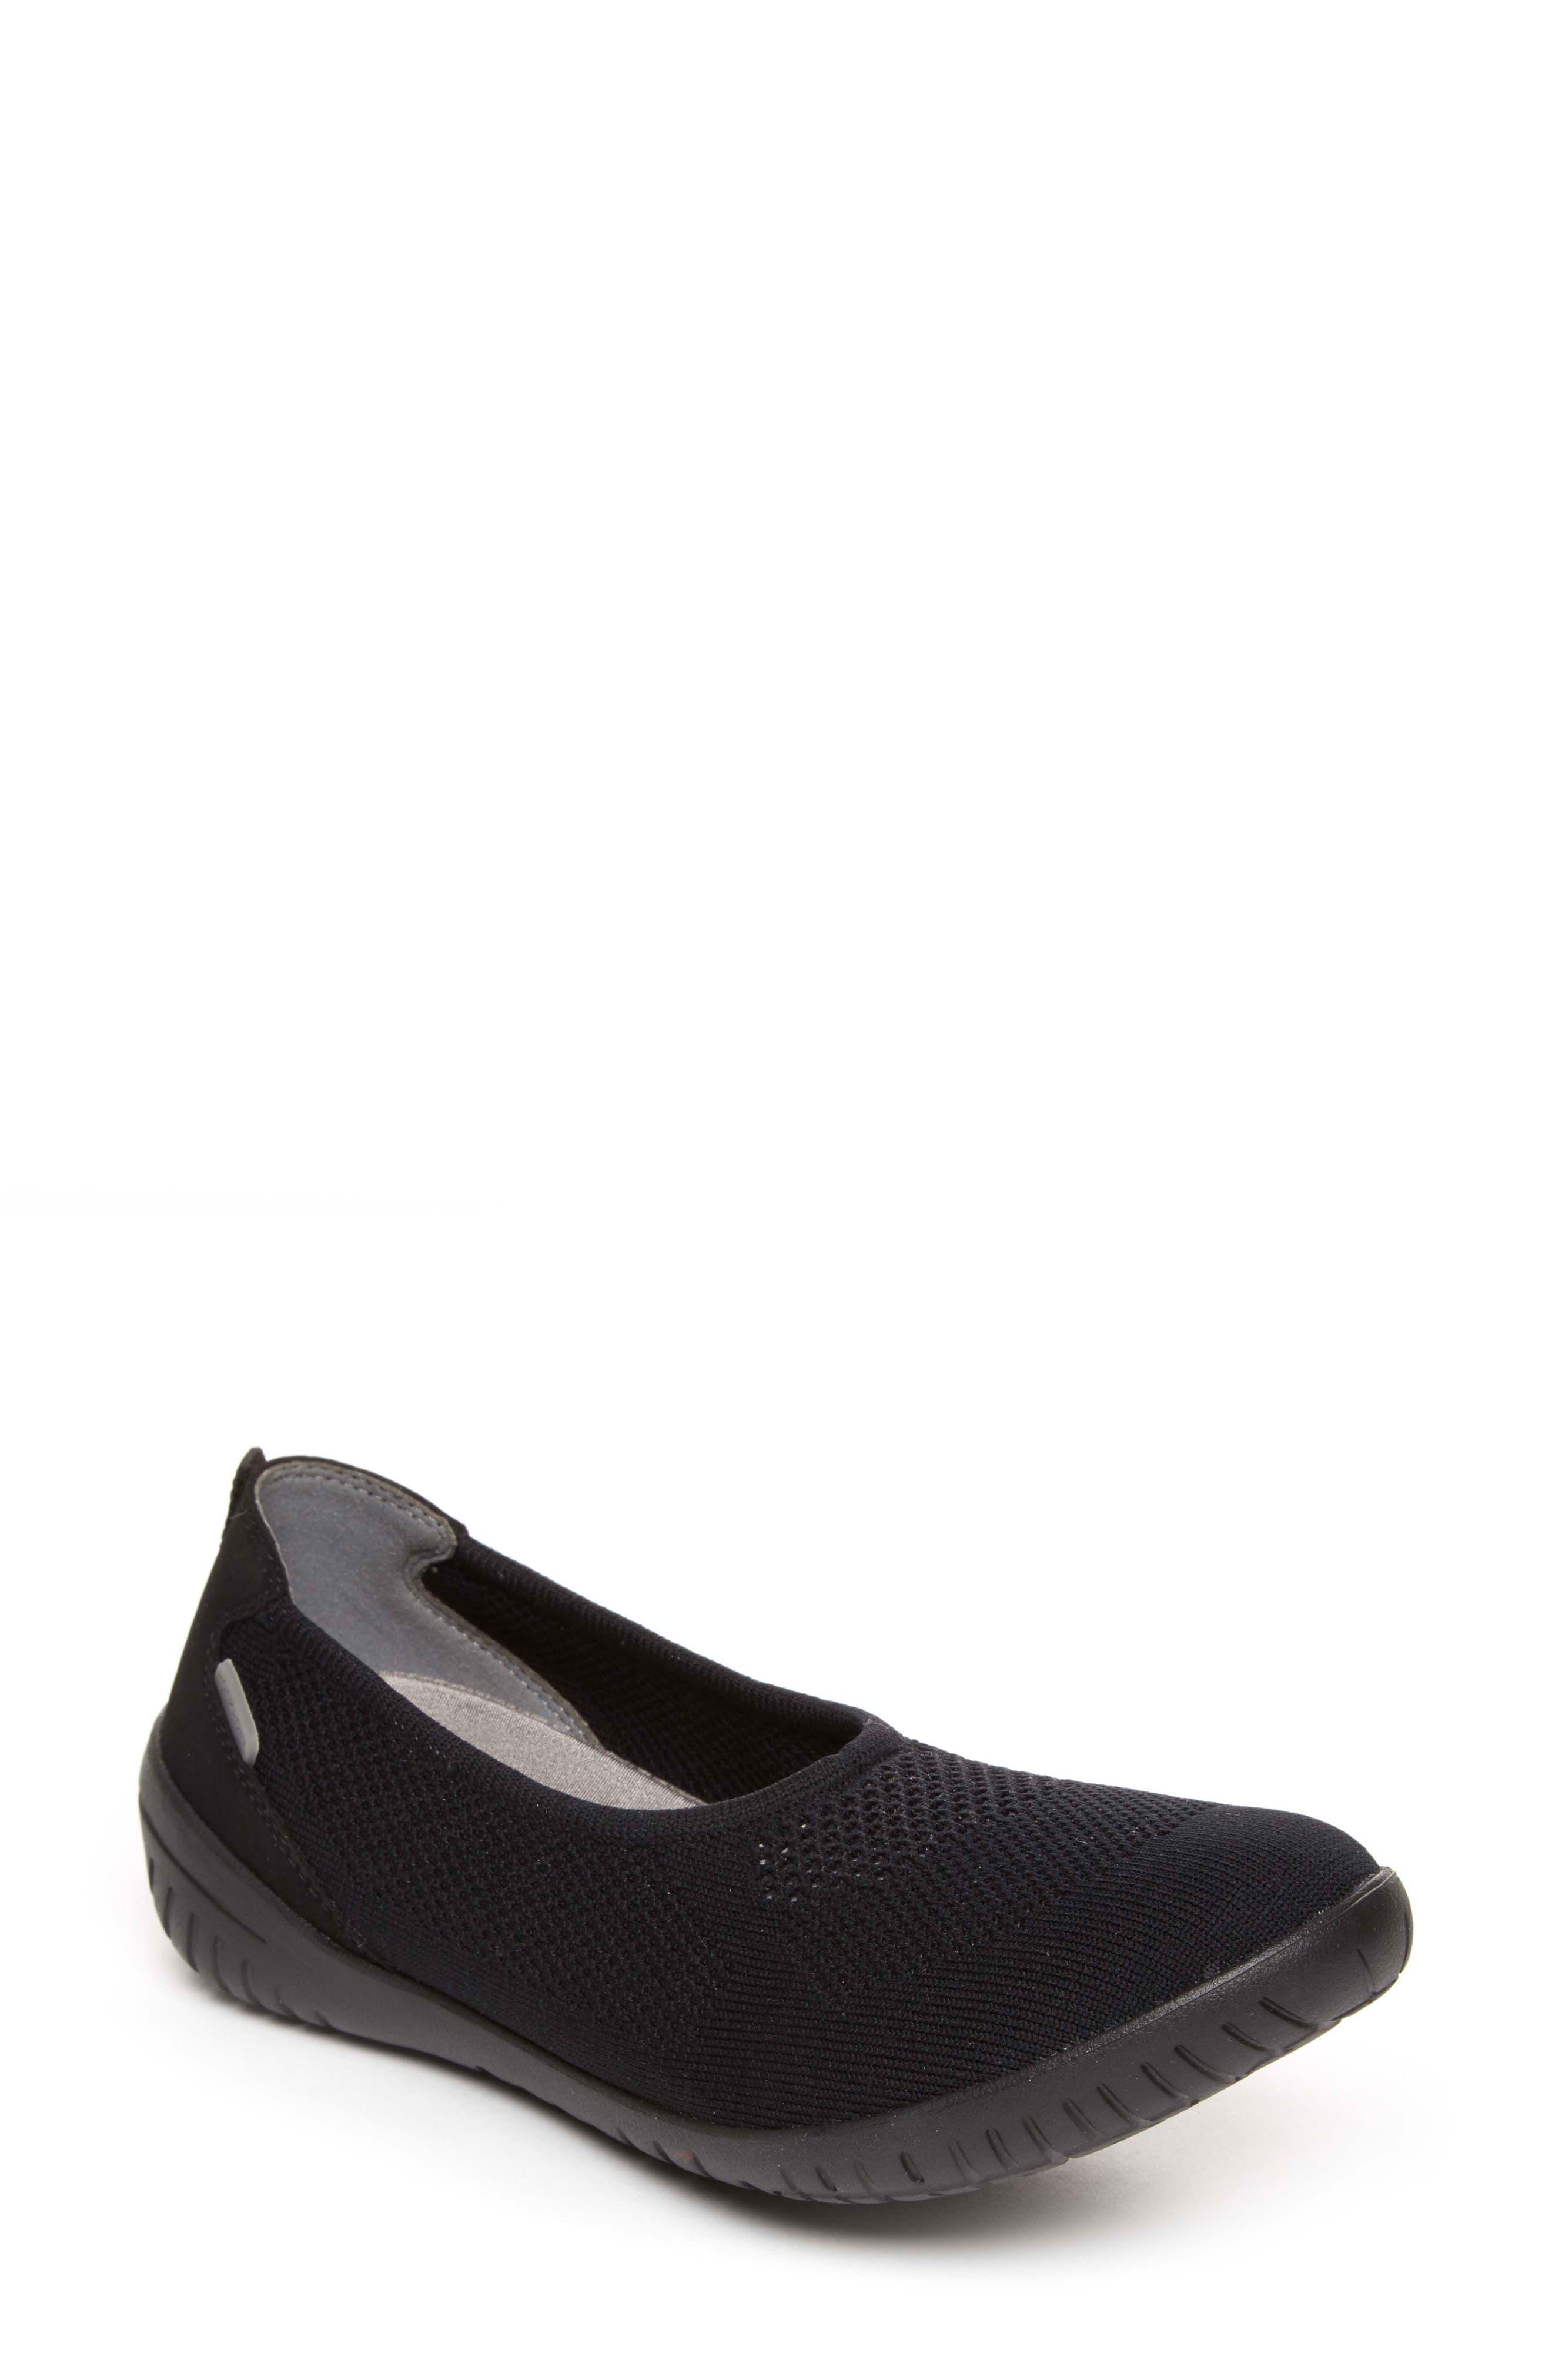 Raelyn Knit Ballet Sneaker,                         Main,                         color, BLACK FABRIC